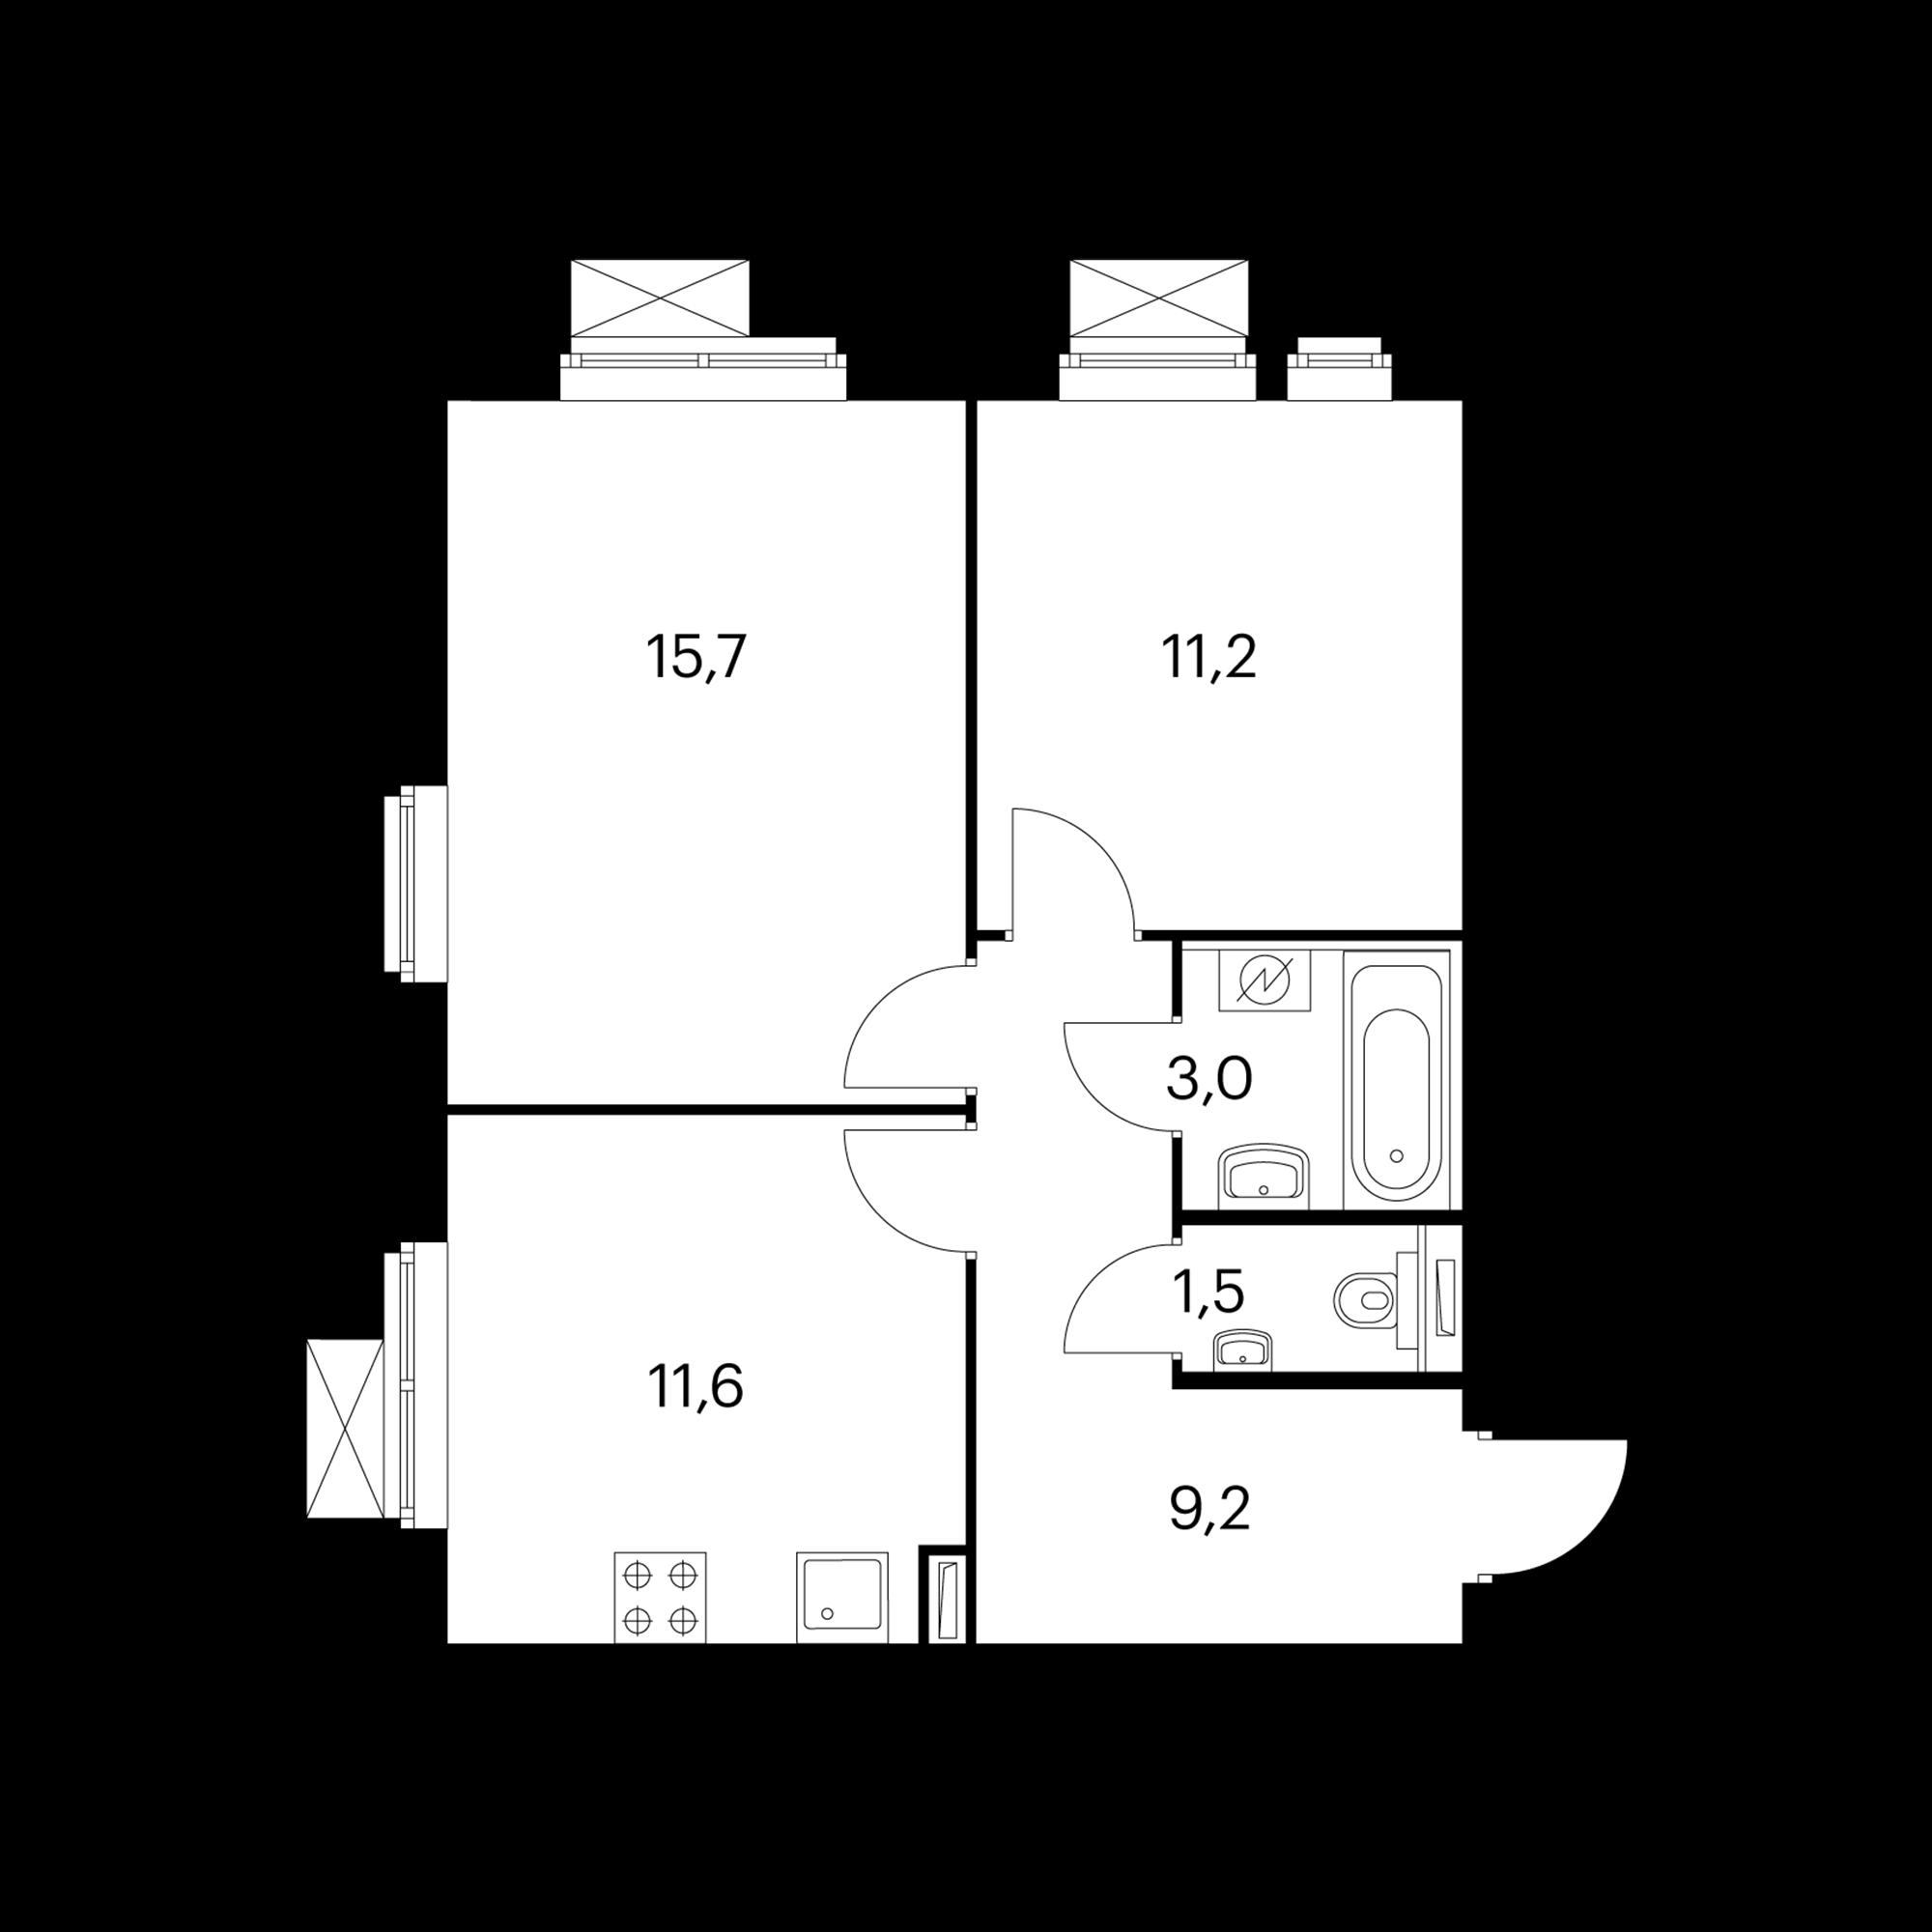 2KS21_6.9-1